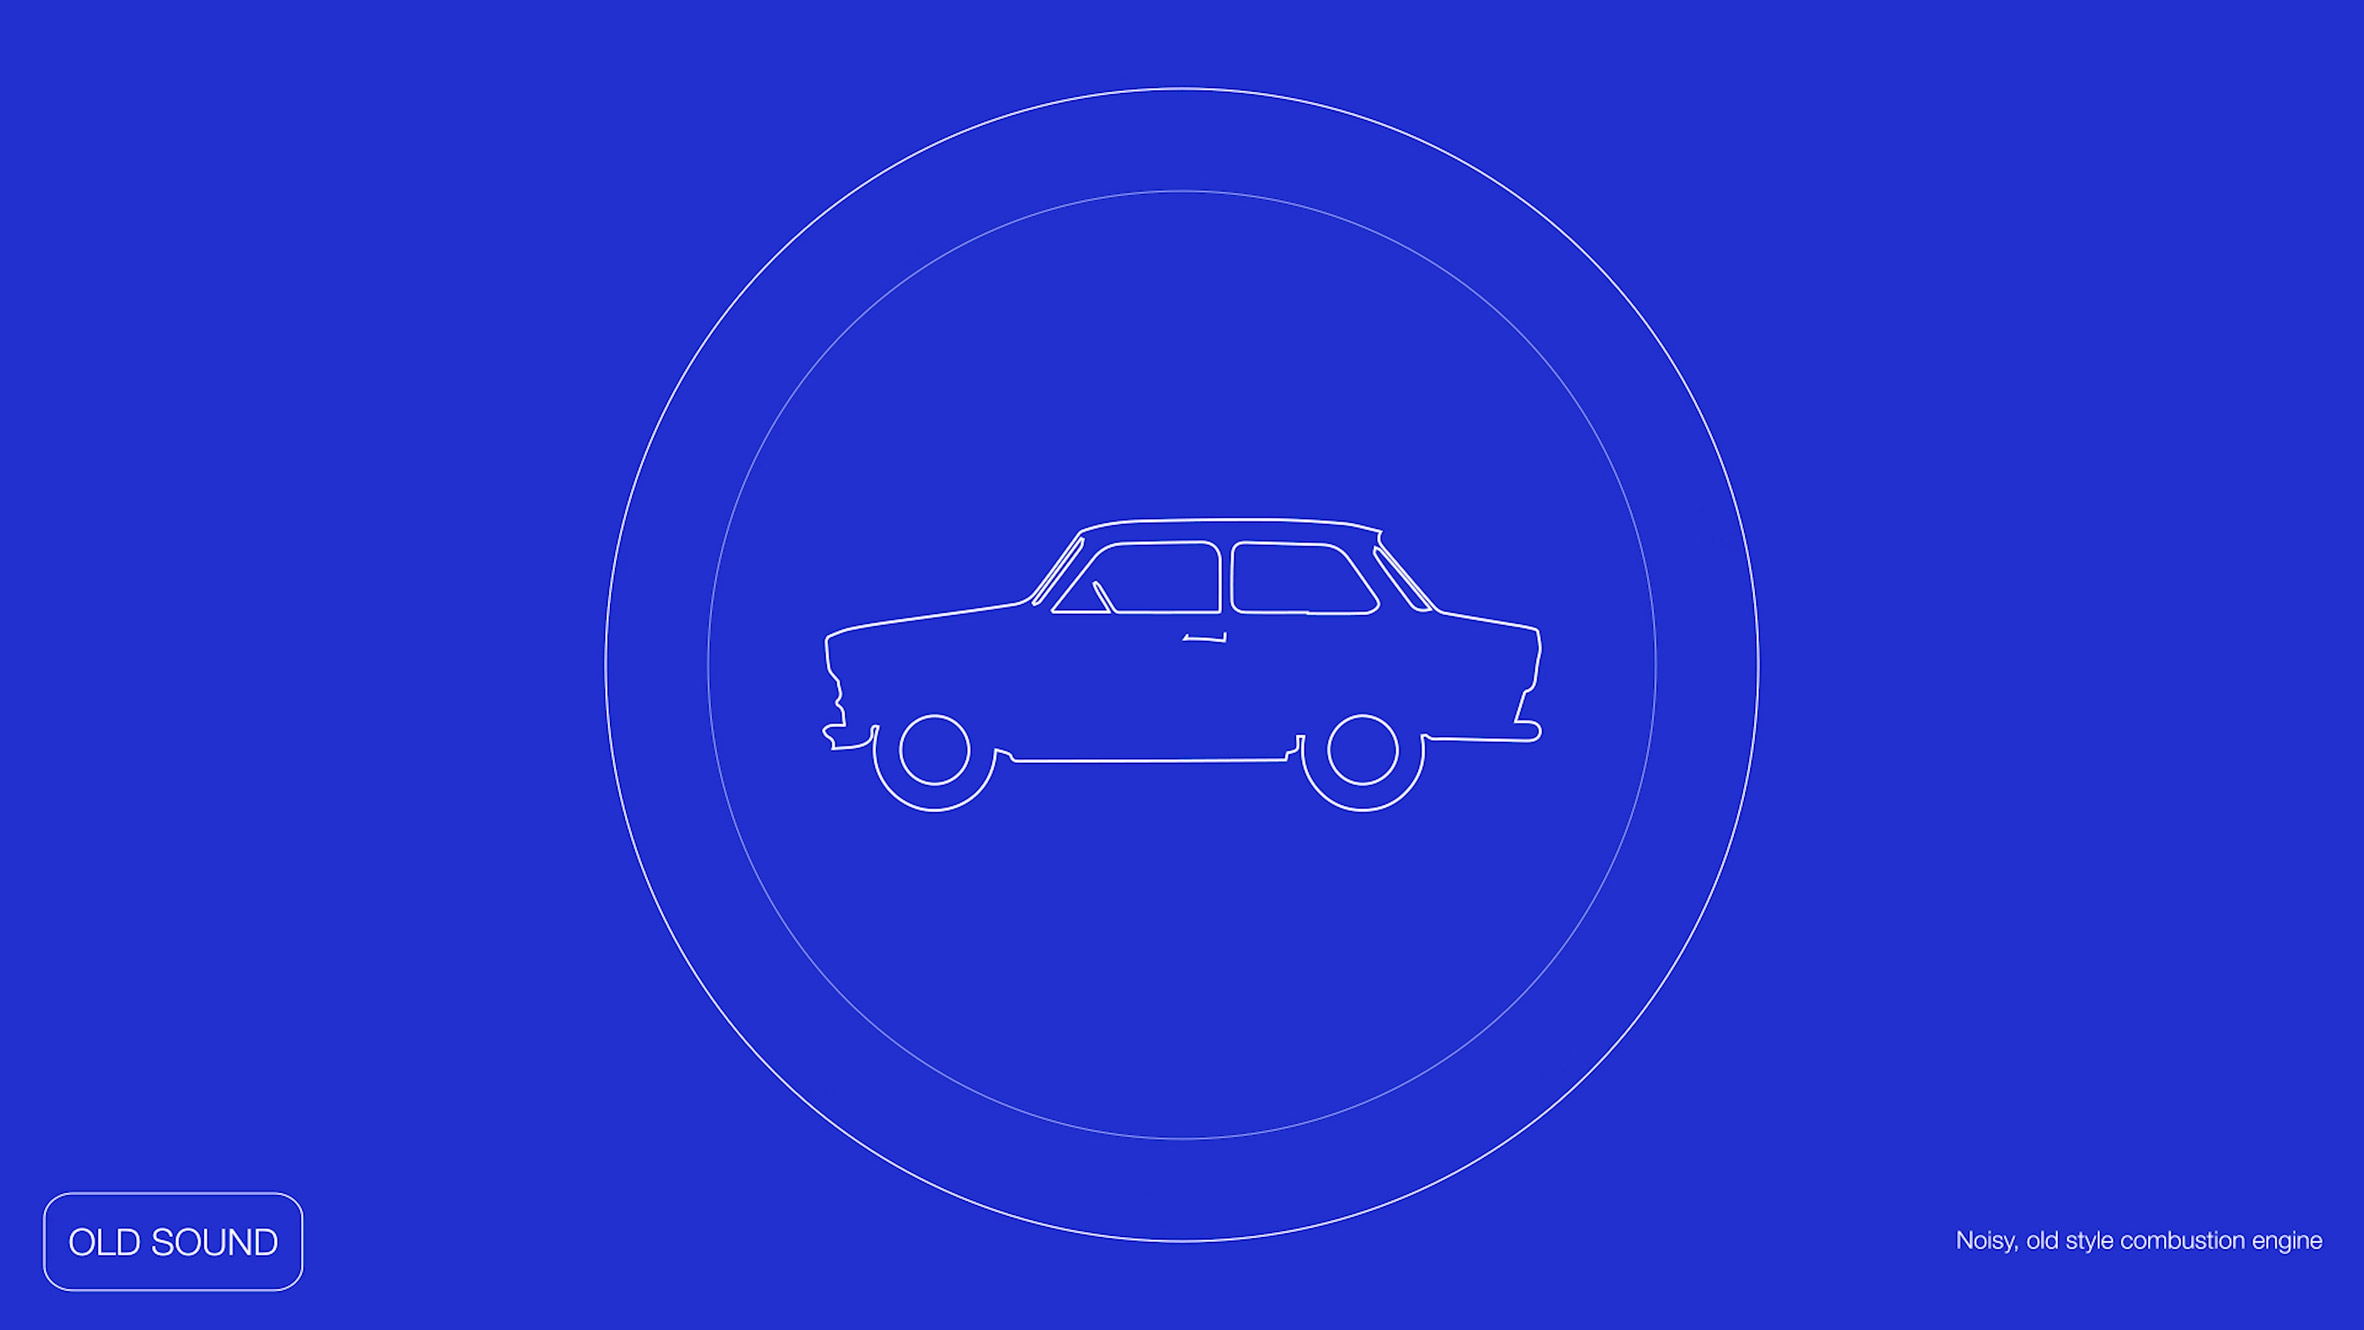 Pentagram graphic showing car on blue backdrop